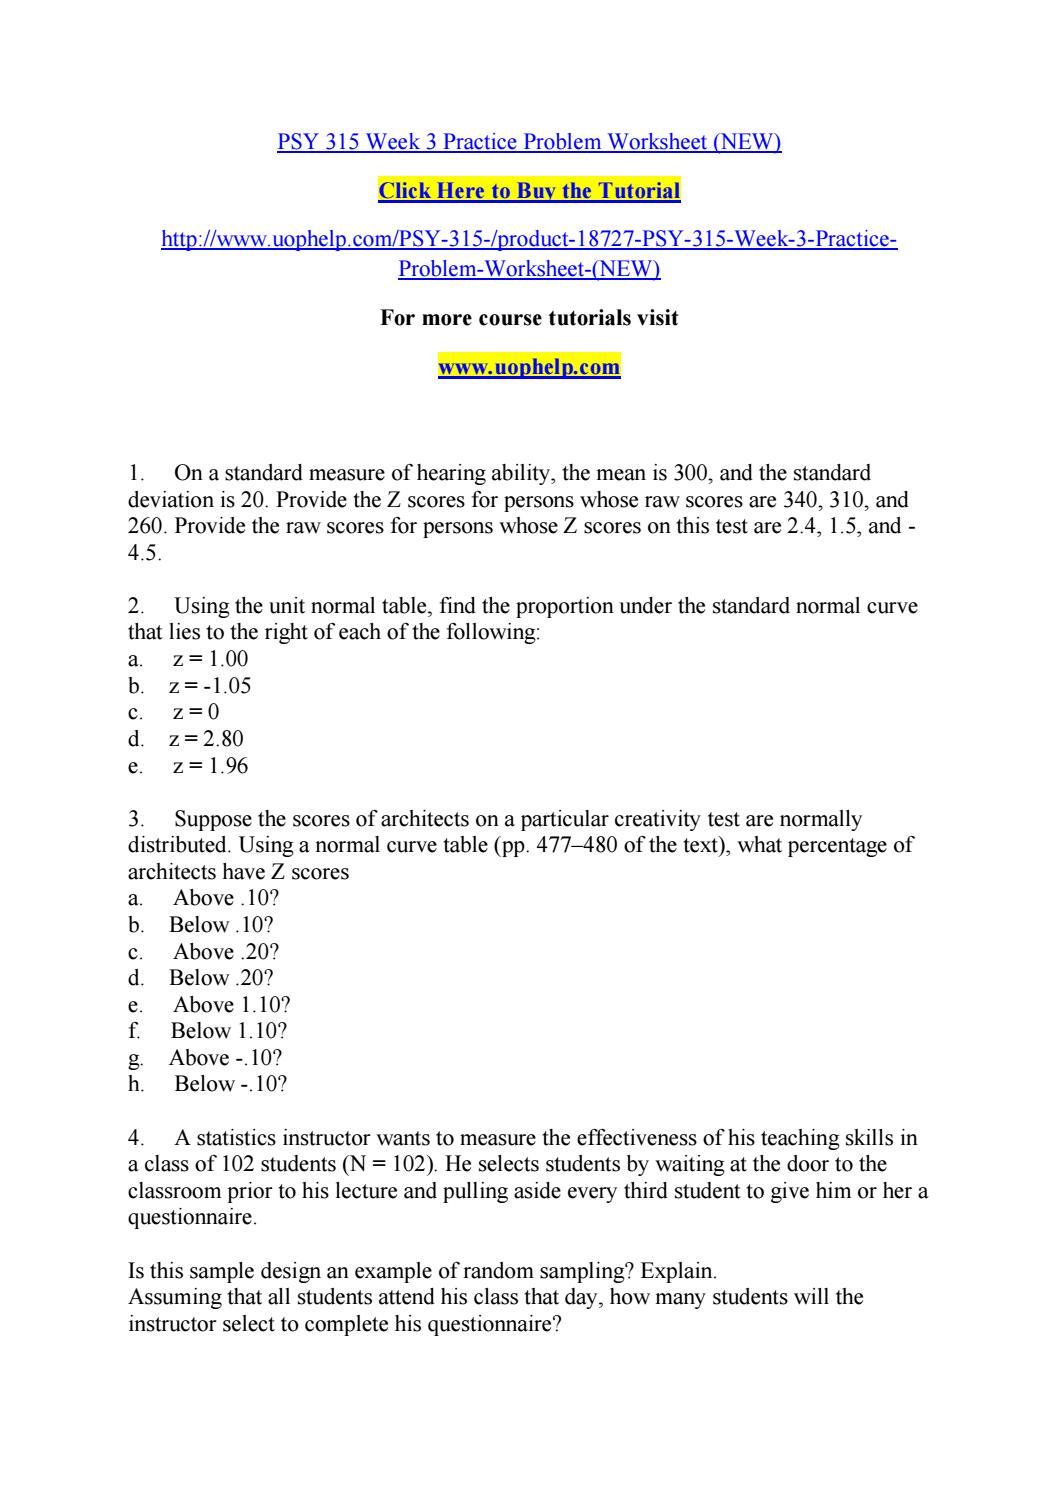 Psy 24 week 24 practice problem worksheet (new) by pinck24 - issuu Intended For Z Score Practice Worksheet